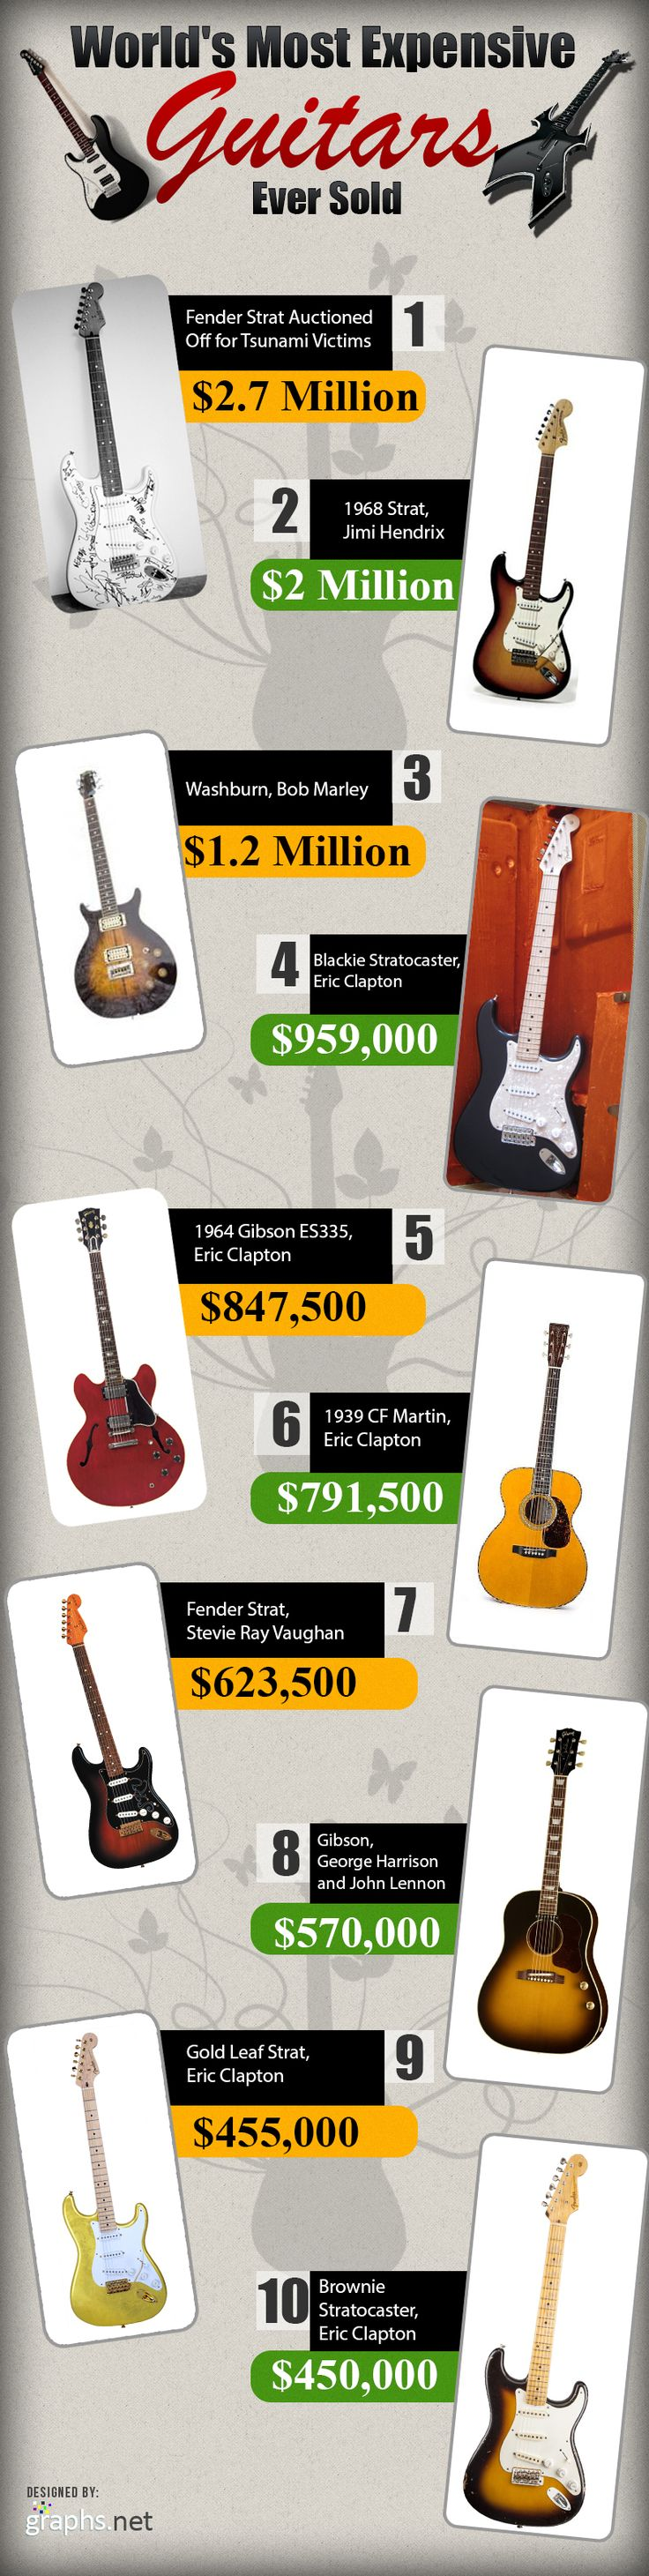 The world's most expensive guitars ever sold! http://www.guitarandmusicinstitute.com